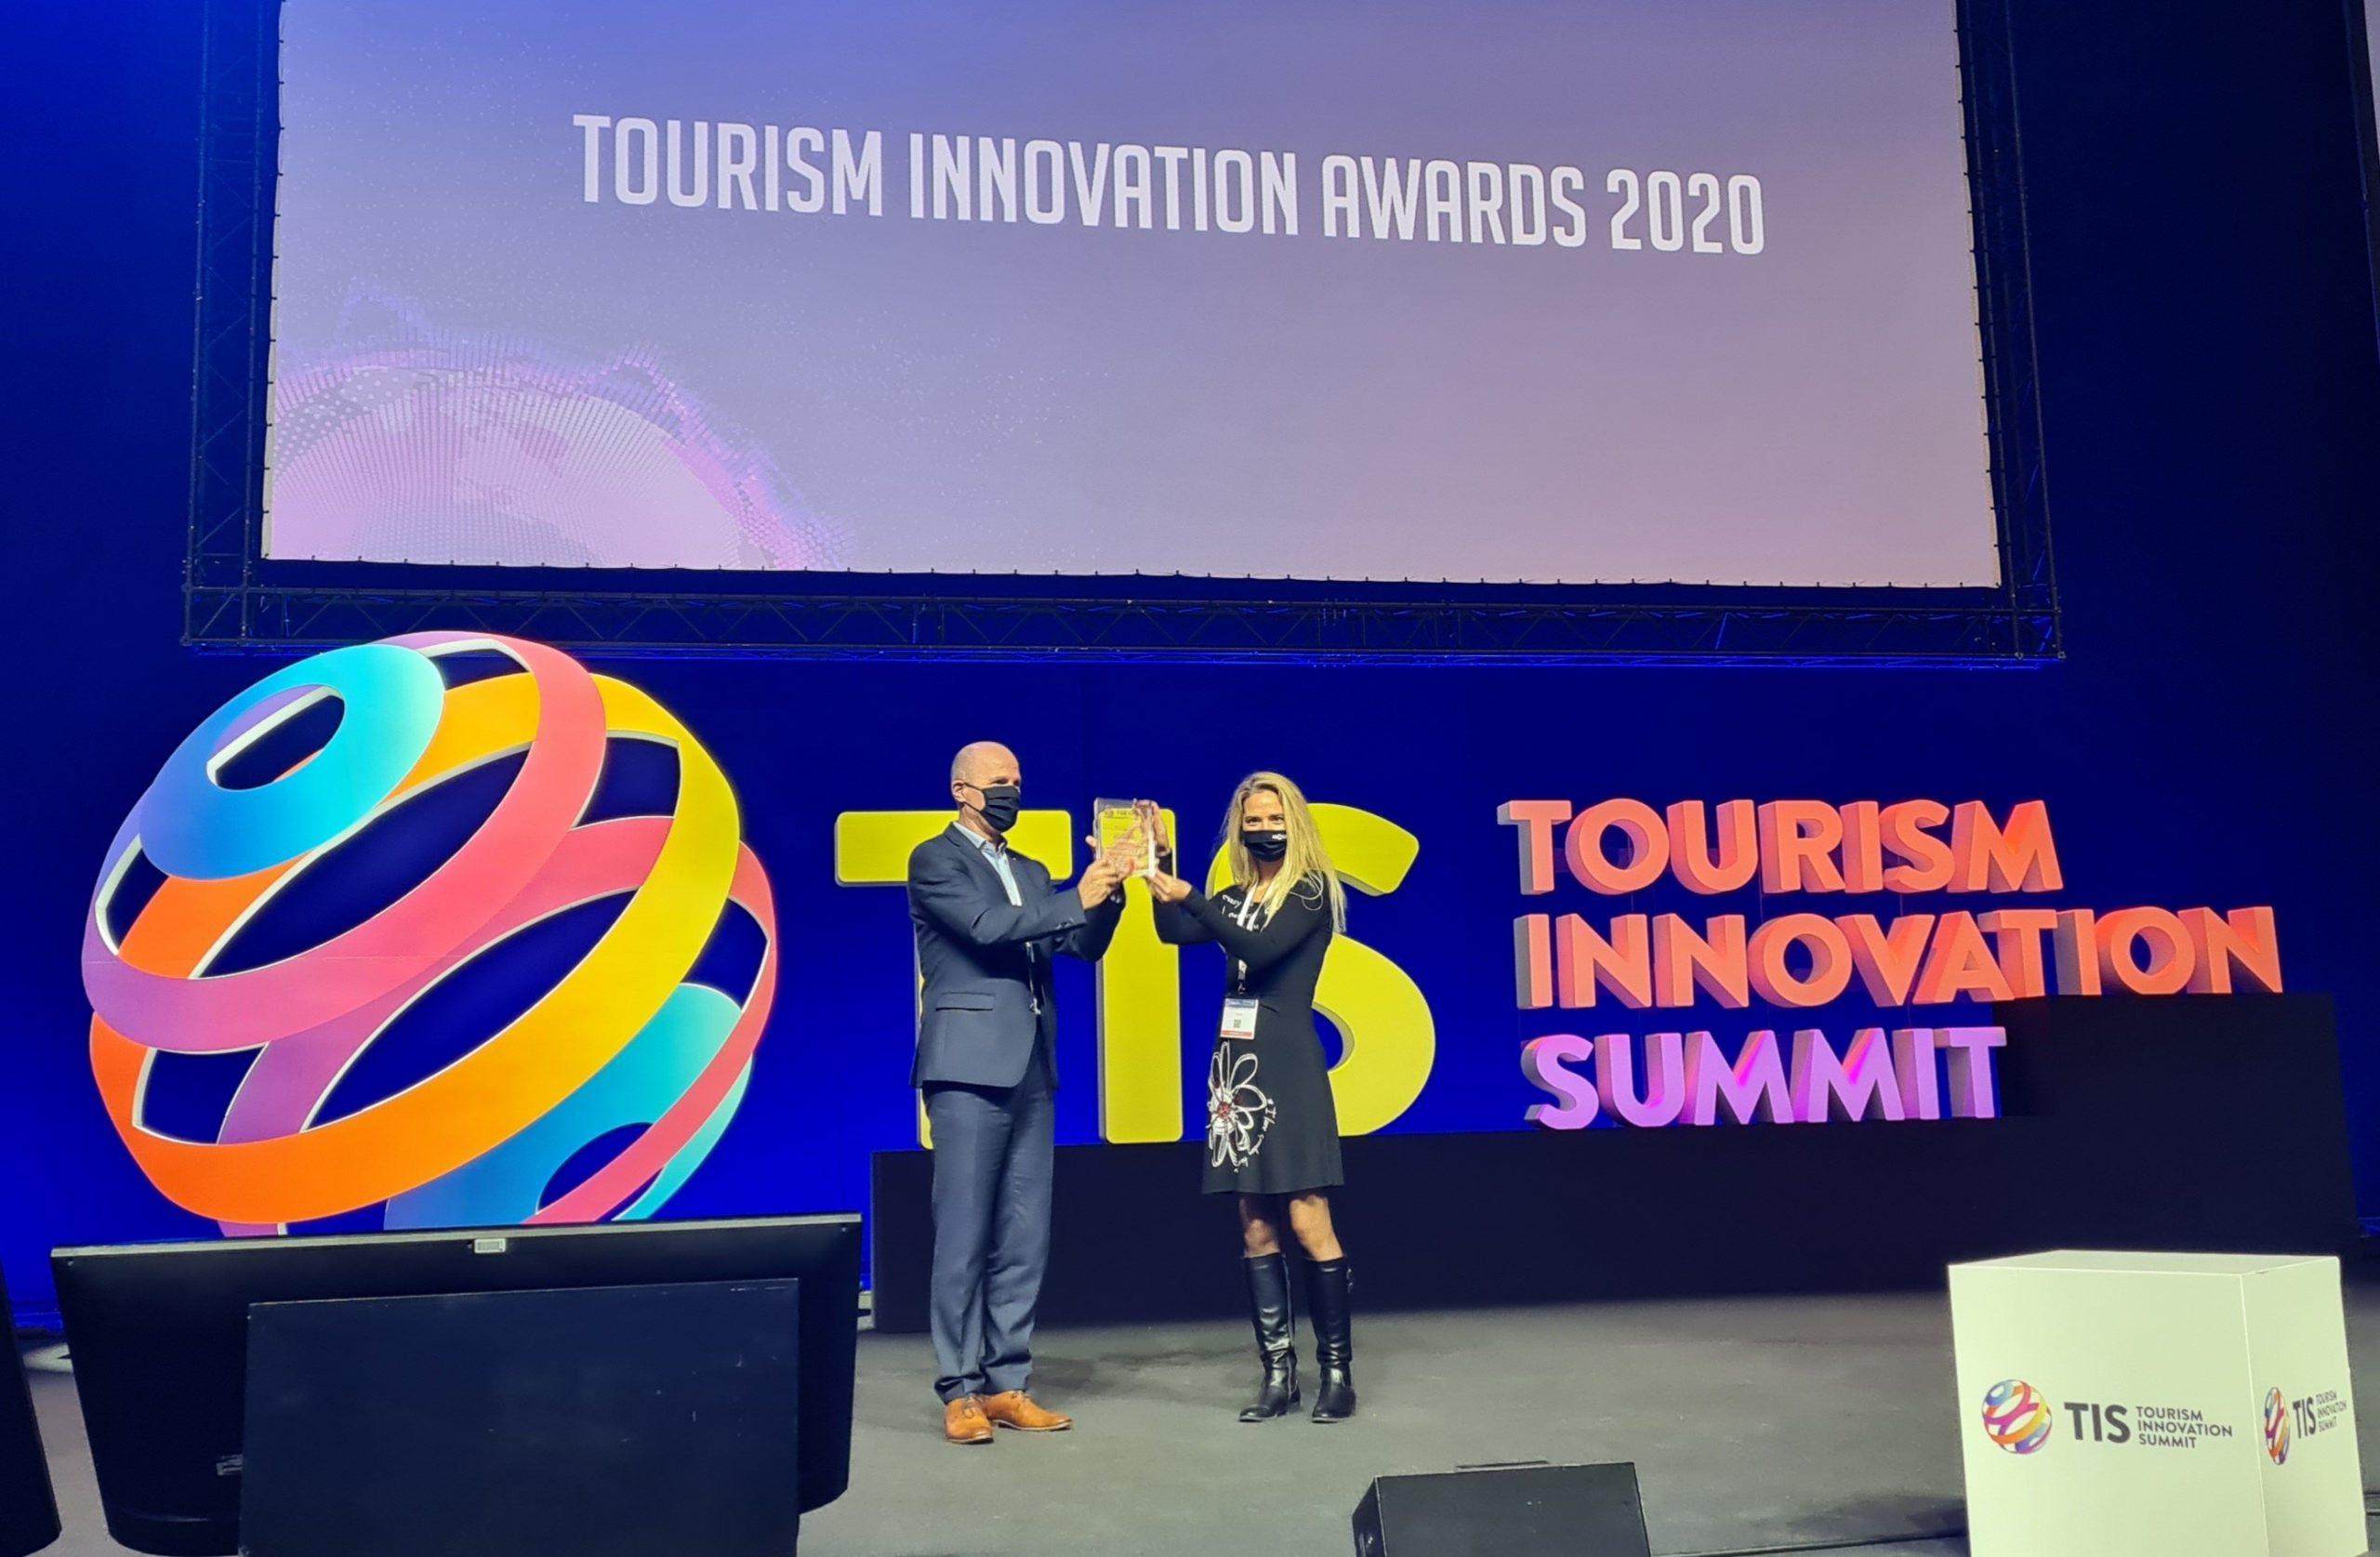 Receiving the award at TIS